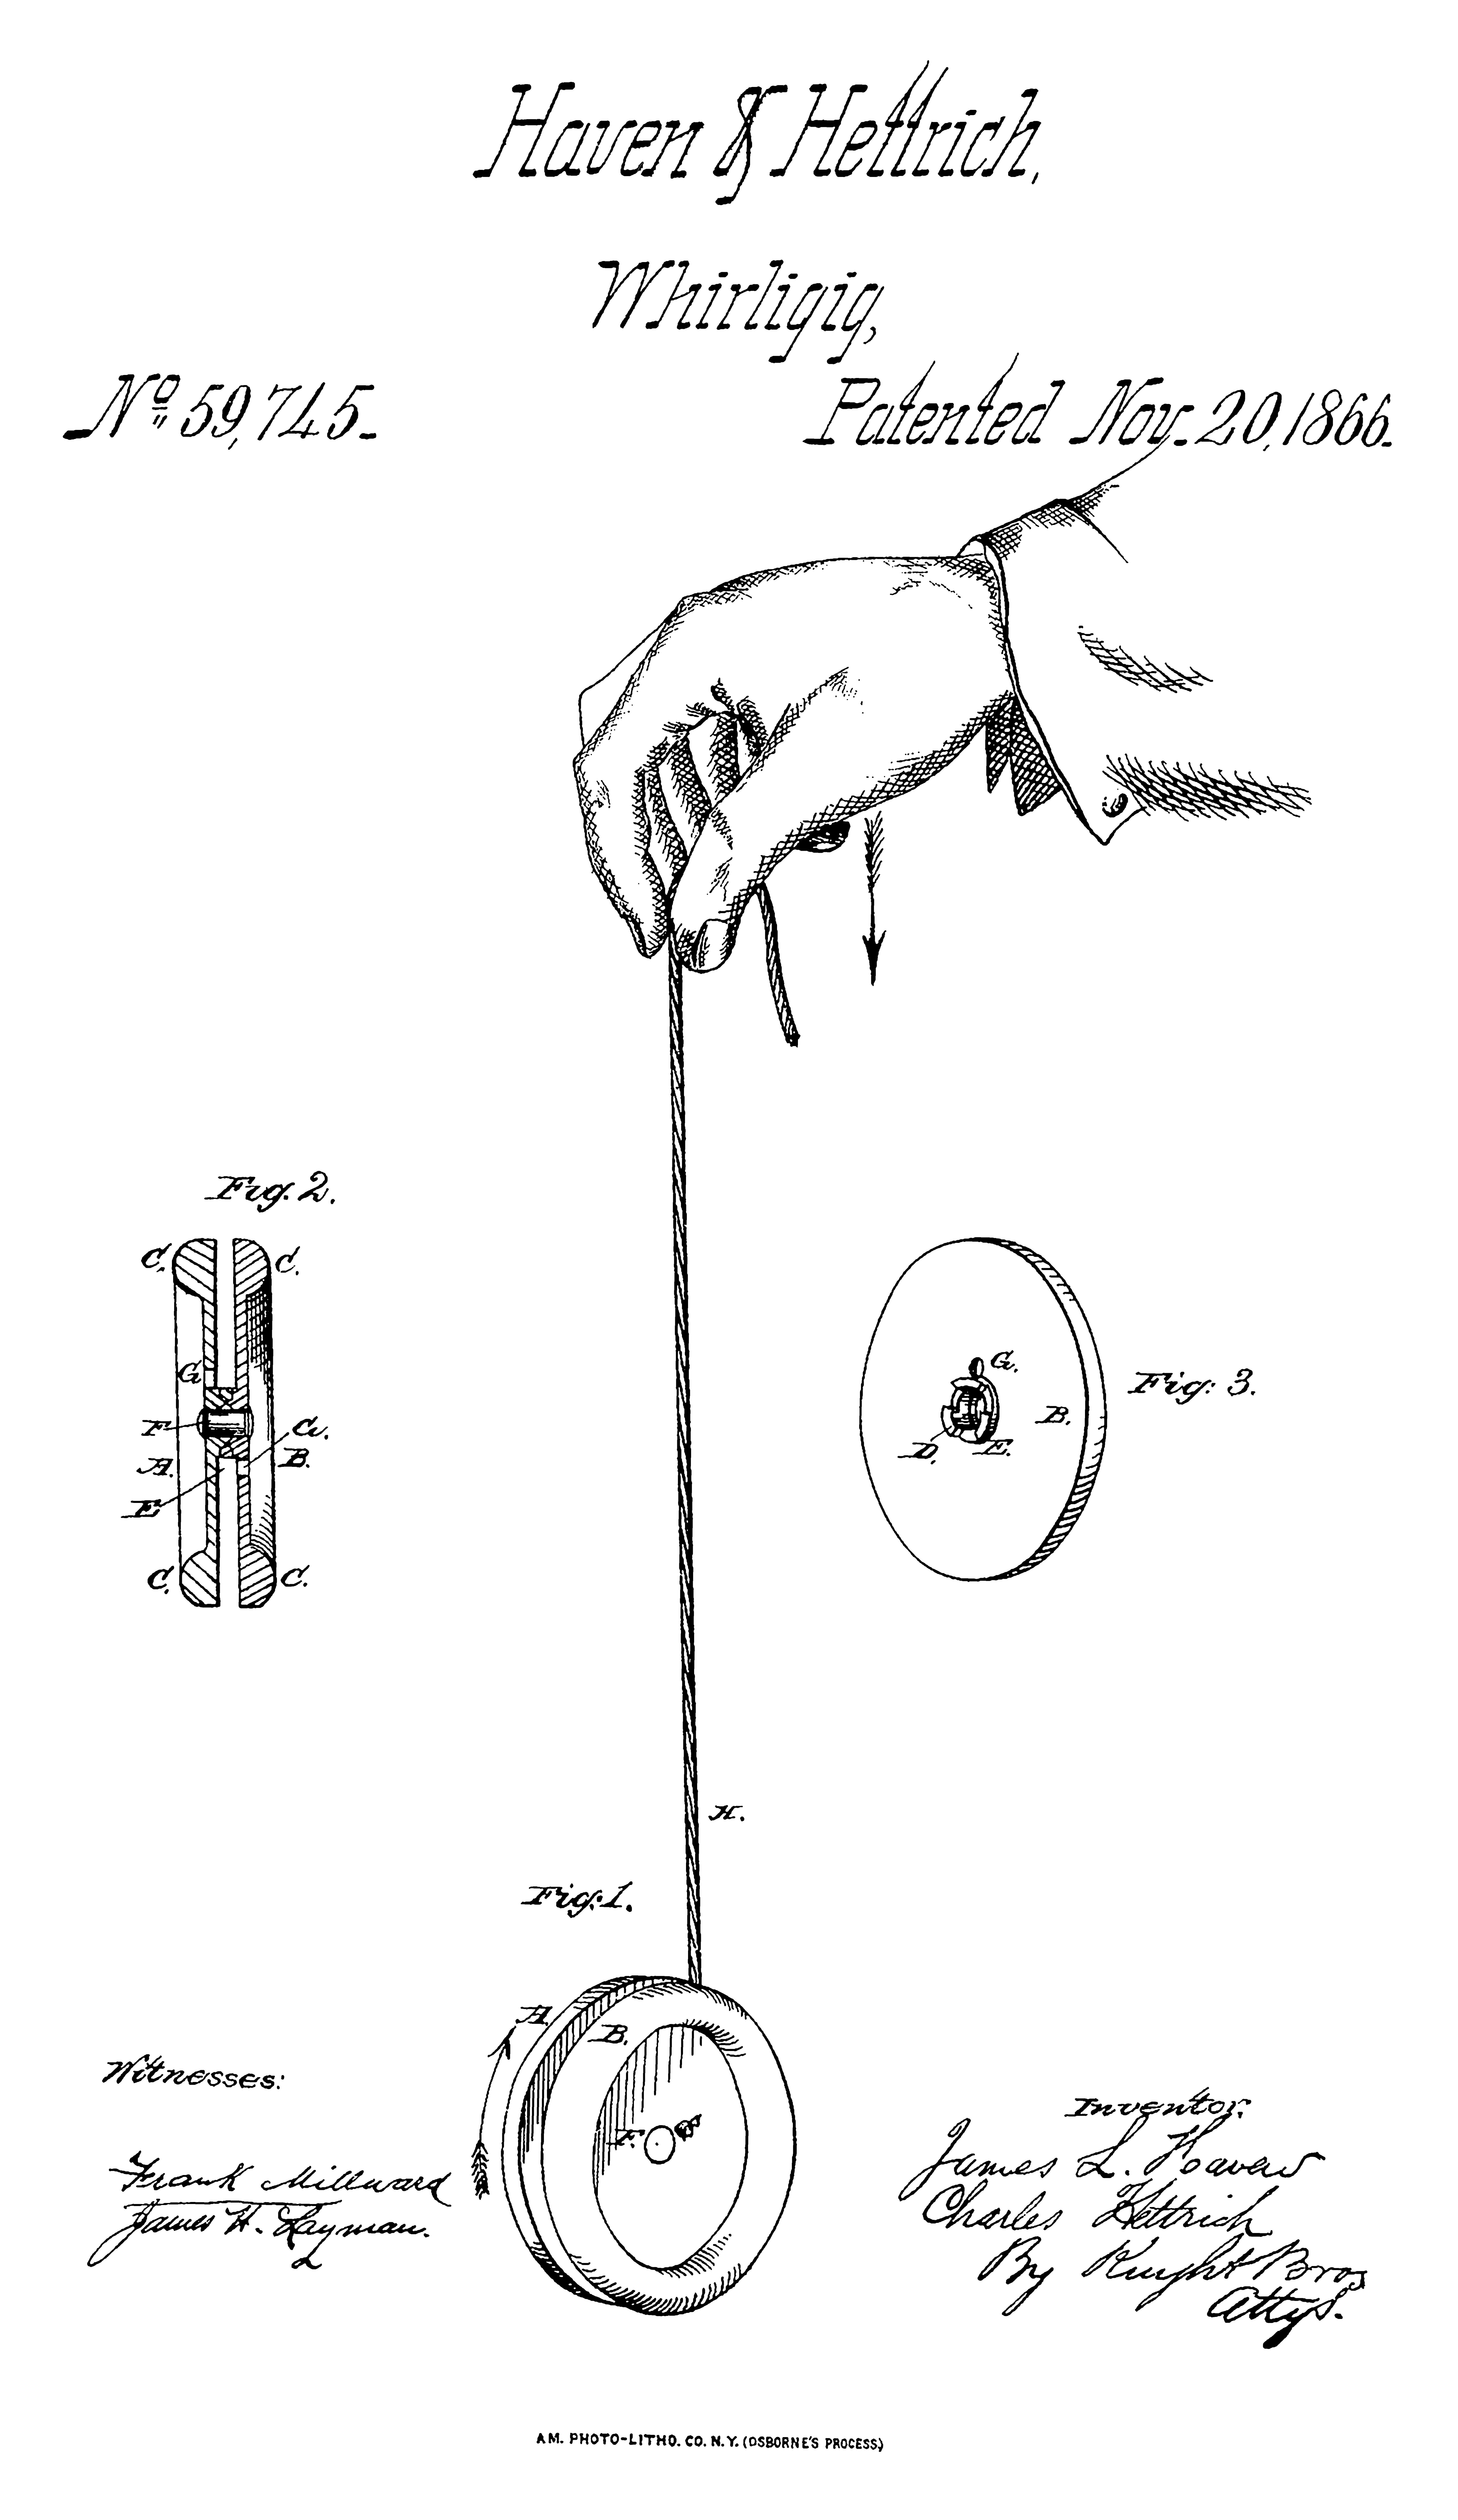 Sezione - Tara & simili > - Pagina 2 Yoyo_patent_1866